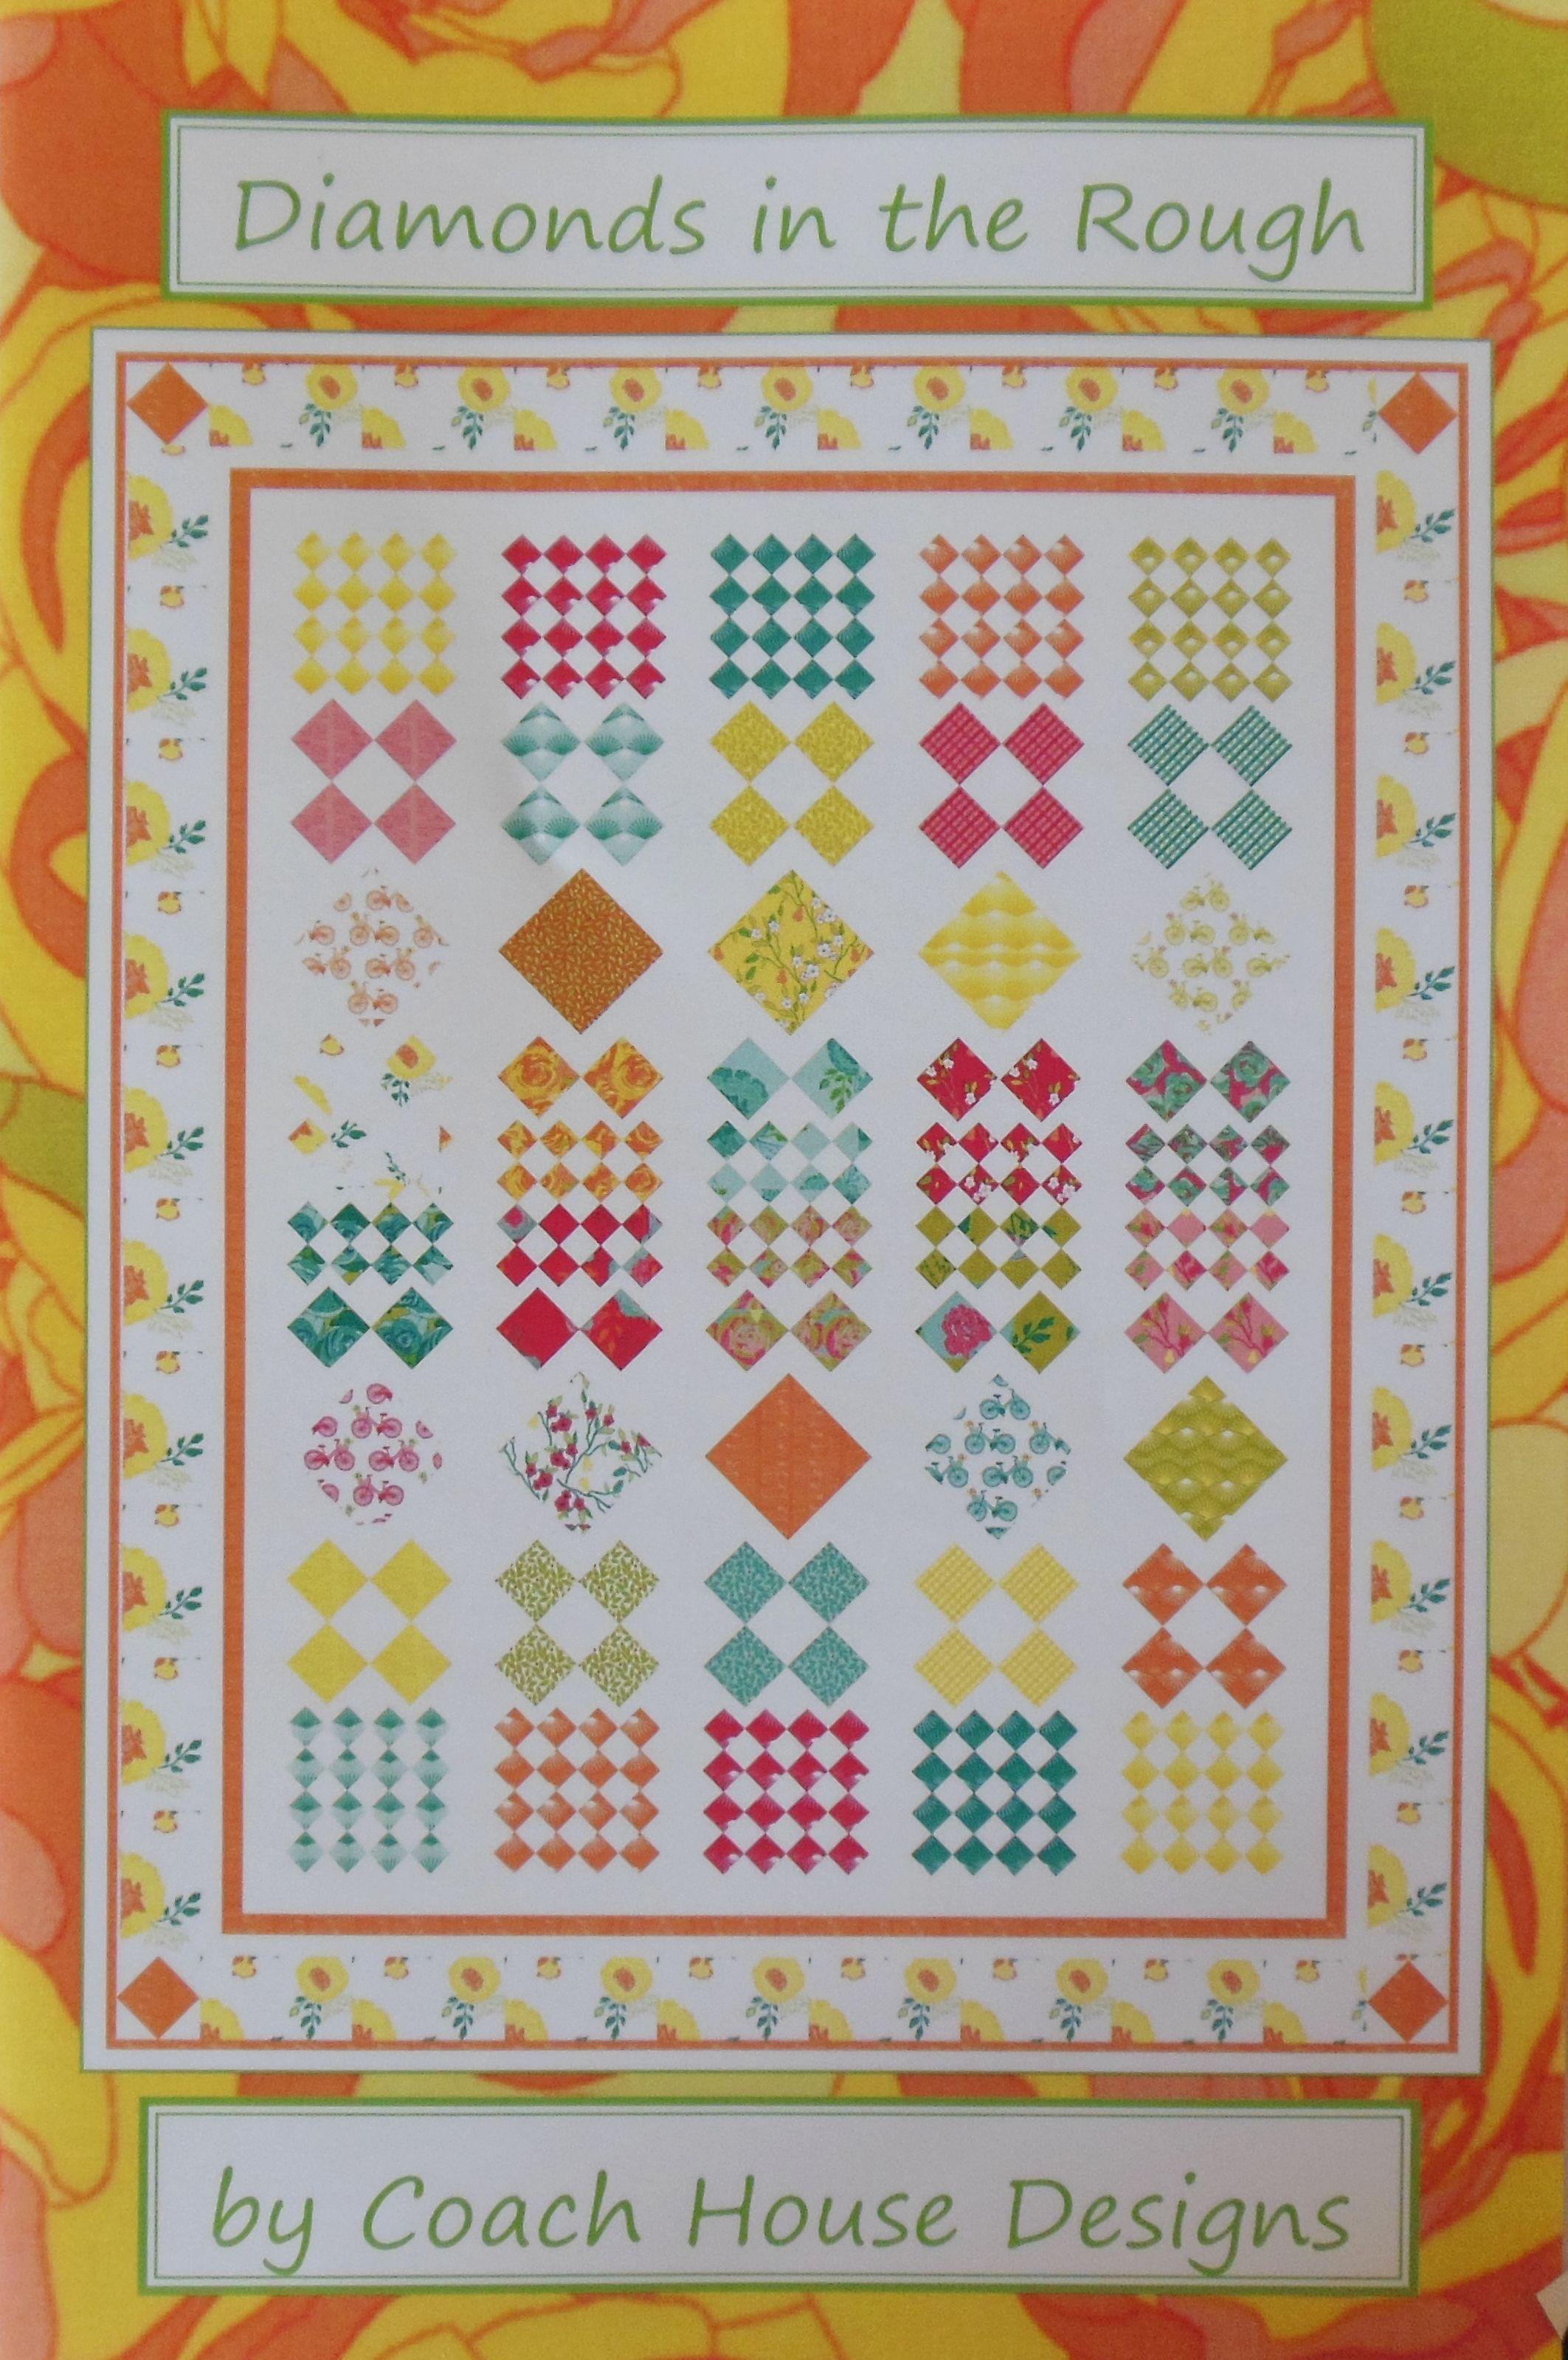 Coach House Designs by Barbara Cherniwchan pattern - Diamonds in the